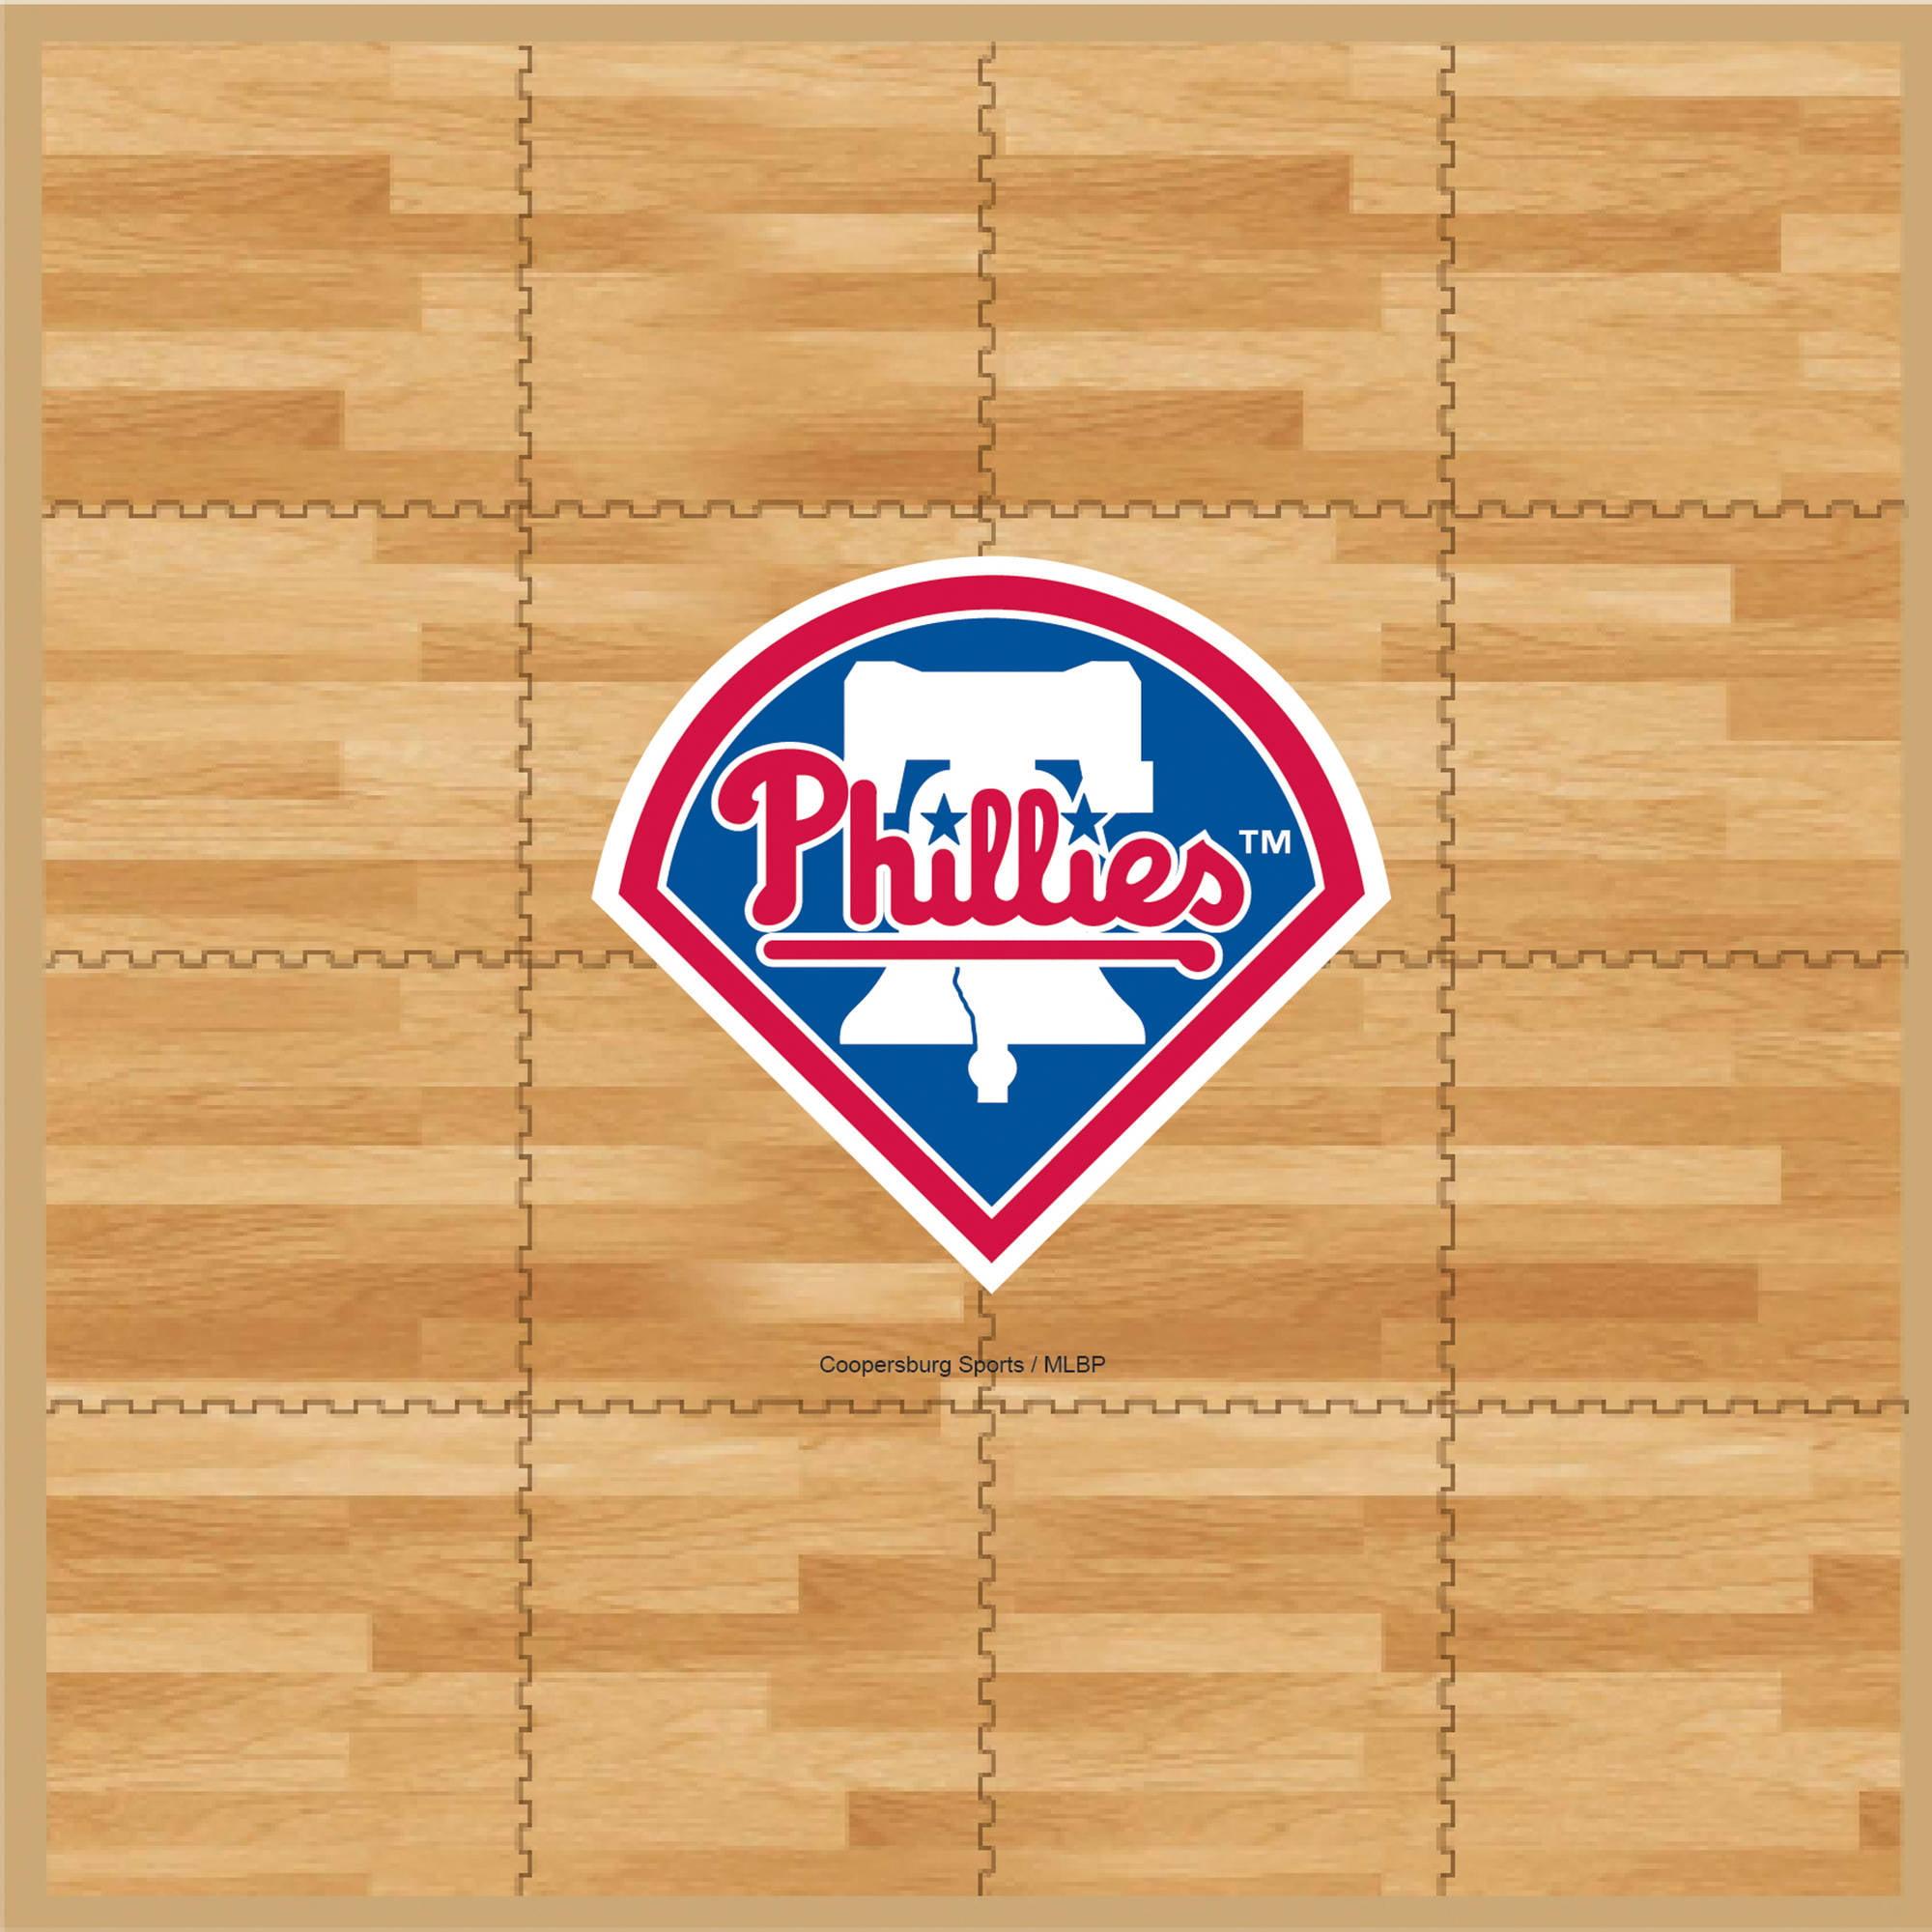 MLB Philadelphia Phillies Portable Foam Puzzle Tailgate Floor Mat by Coopersburg Sports